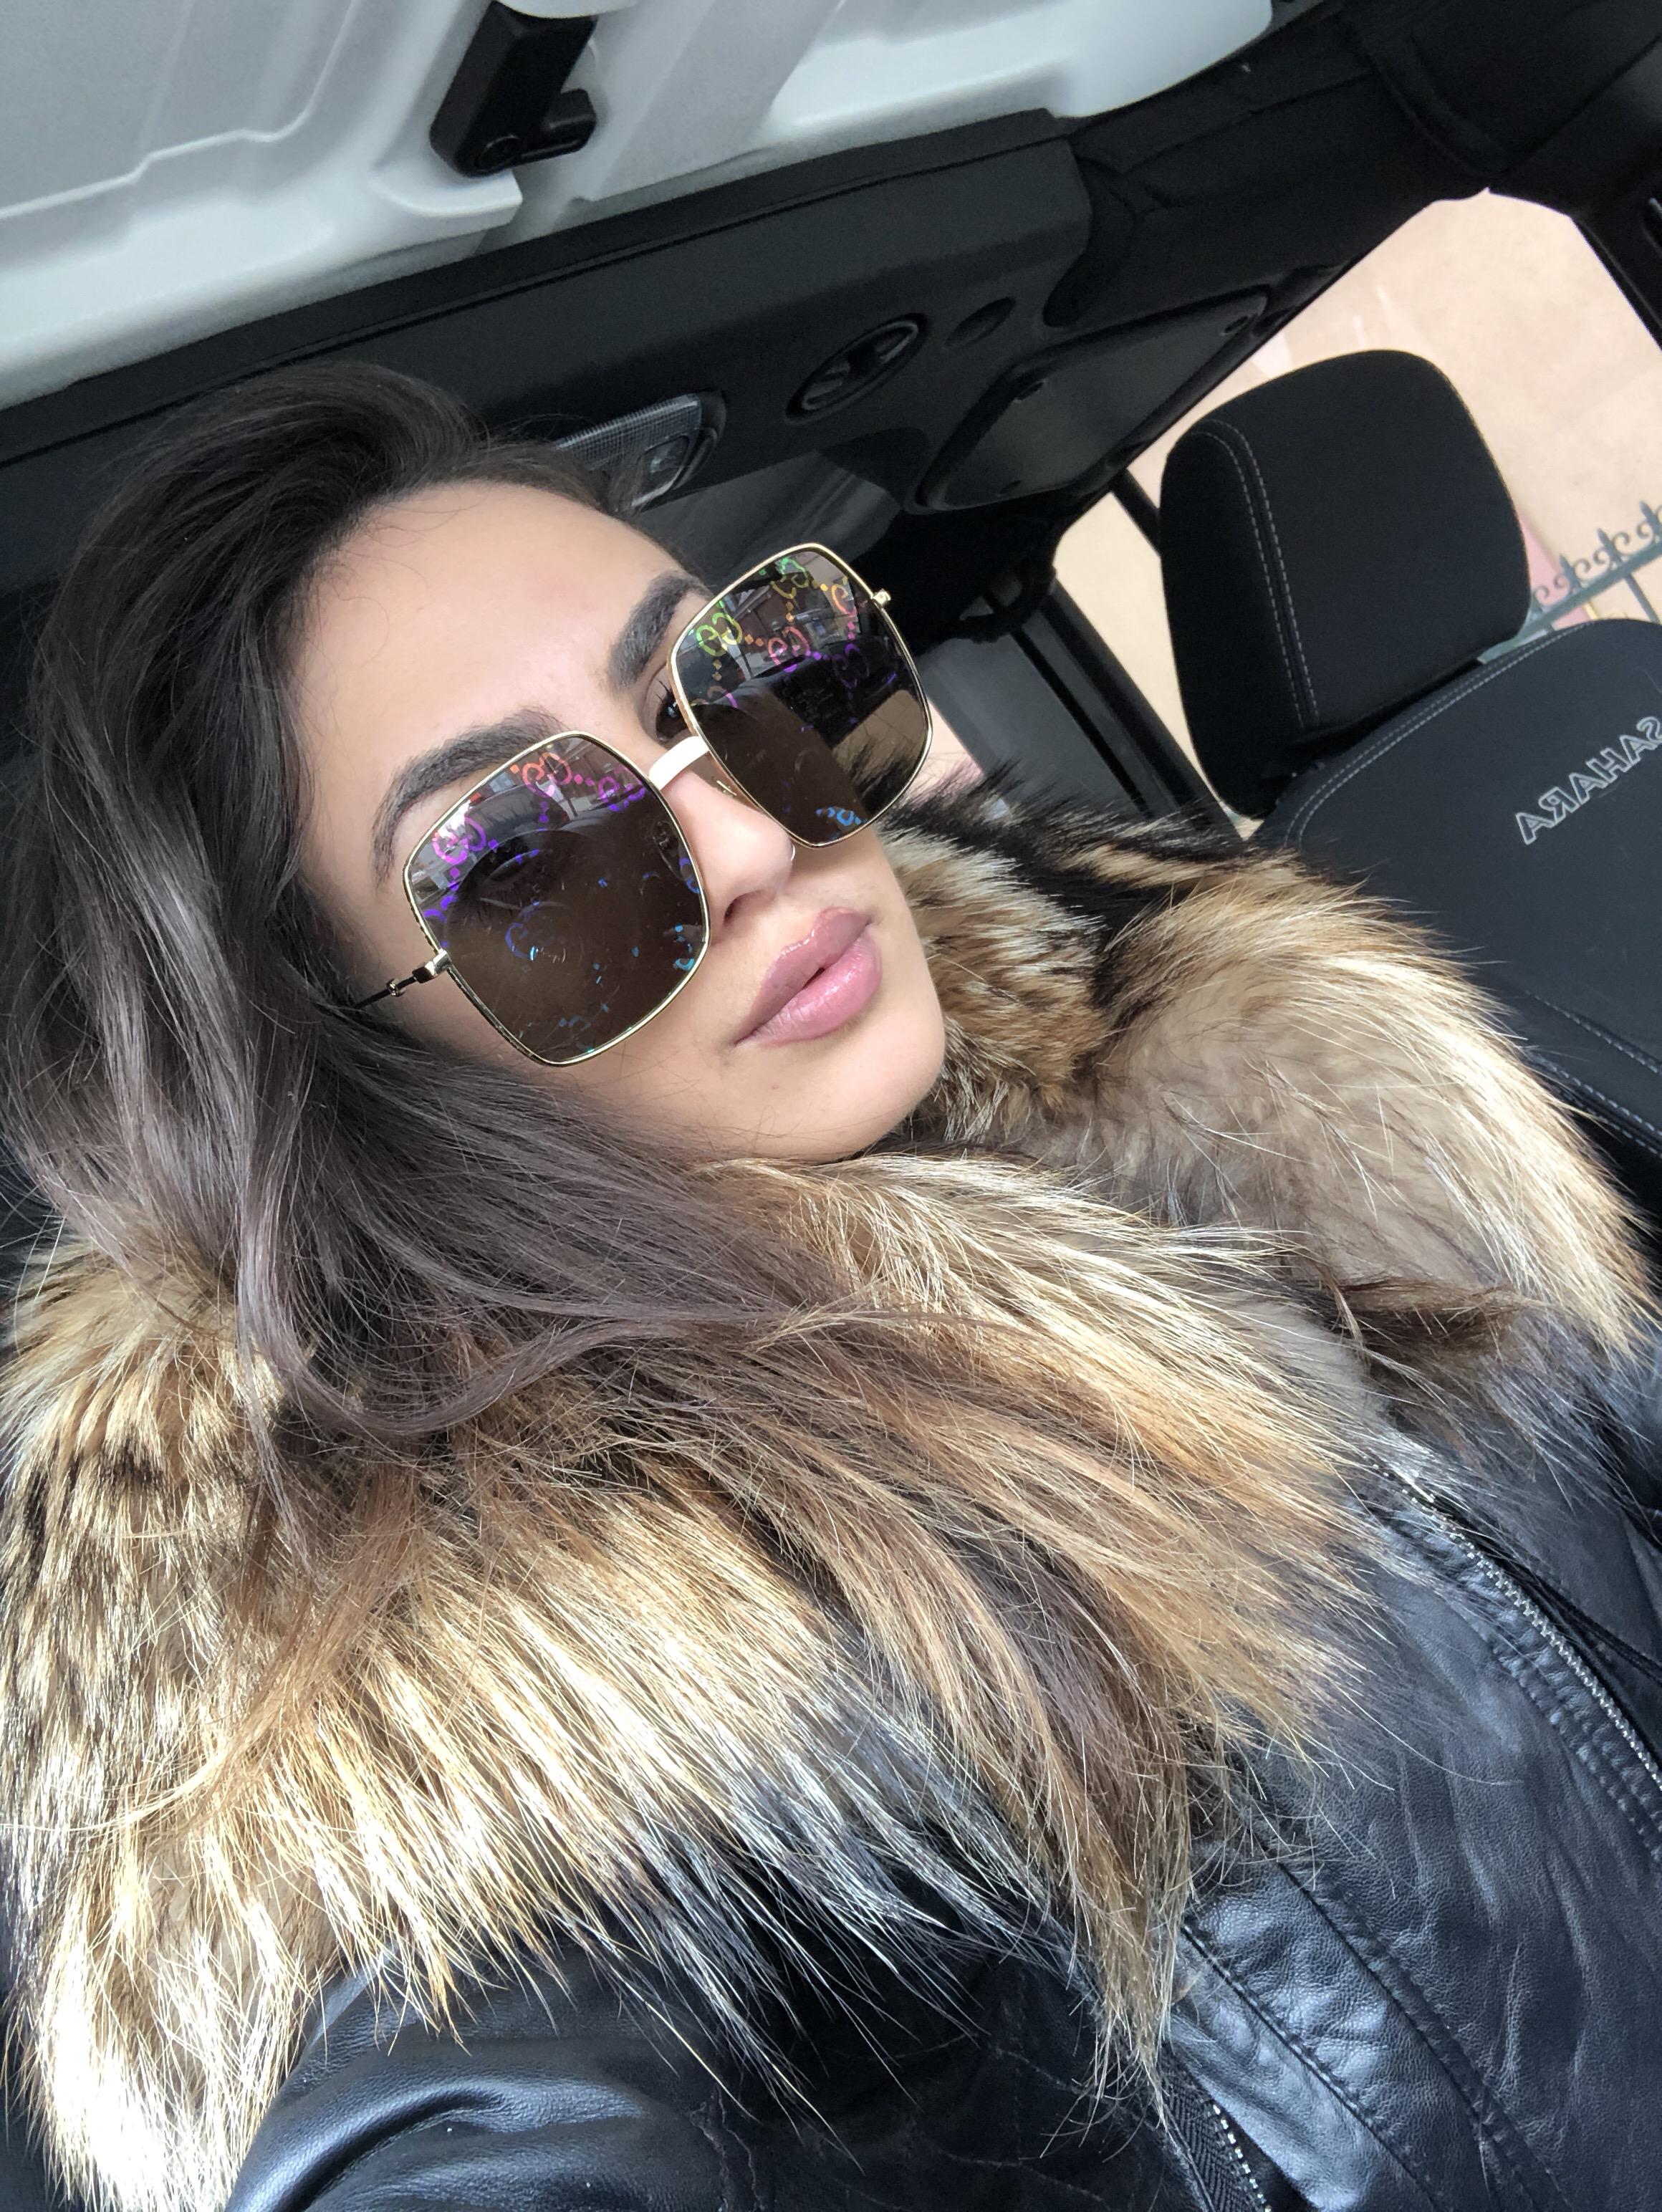 26f87fdf5 Gucci 0414S Rainbow Mirrored Lens Oversized Sunglasses (3 Colors).  B7978495-593D-4775-9466-B94C164318A1.jpg